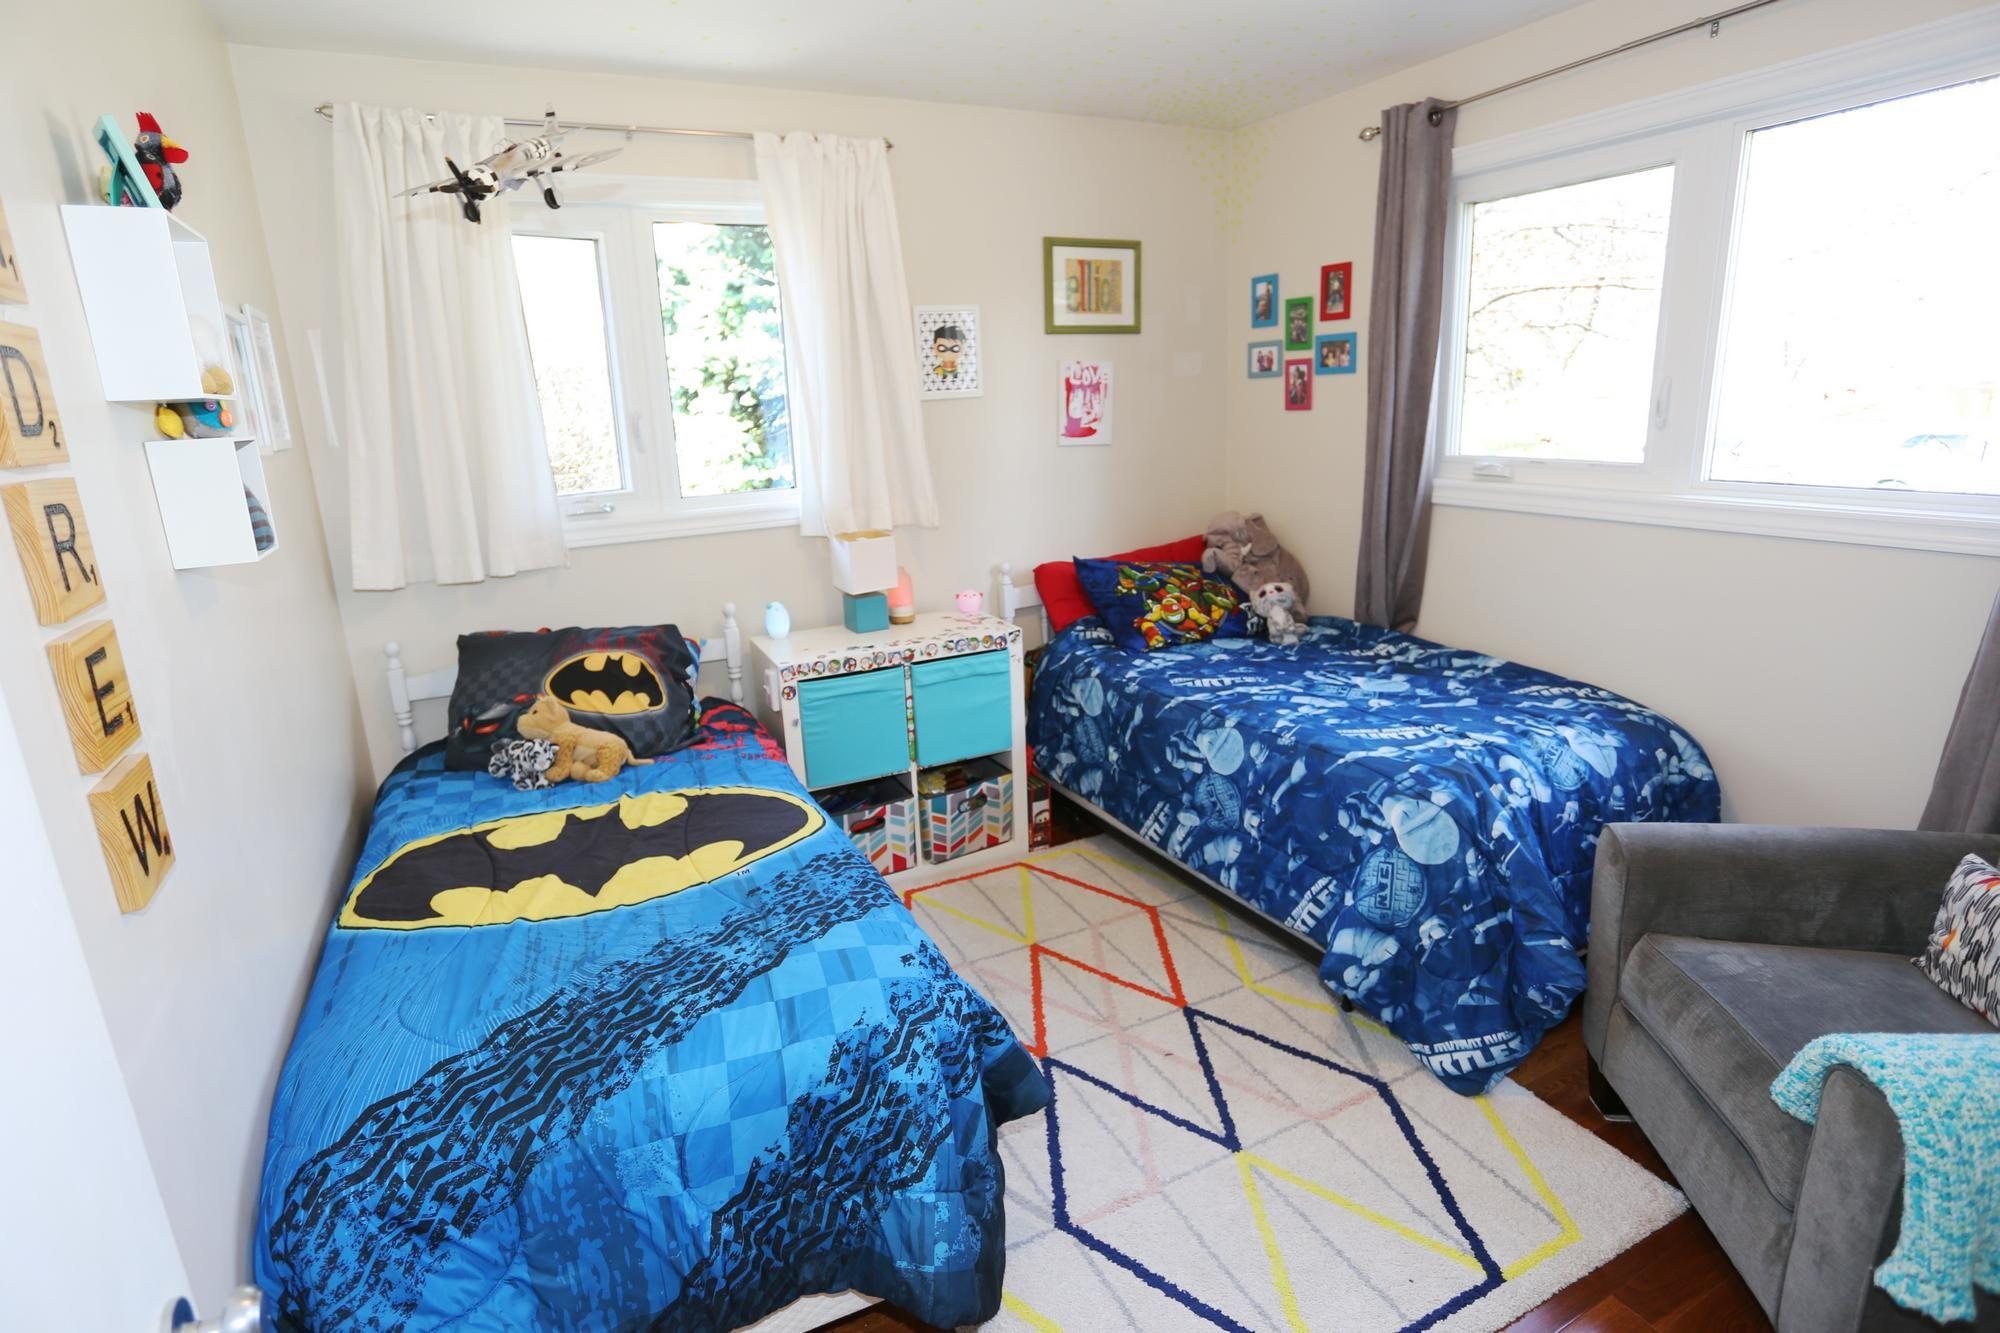 Photo 19: Photos: 1322 Valour Road in Winnipeg: Sargent Park Single Family Detached for sale (5C)  : MLS®# 1811835